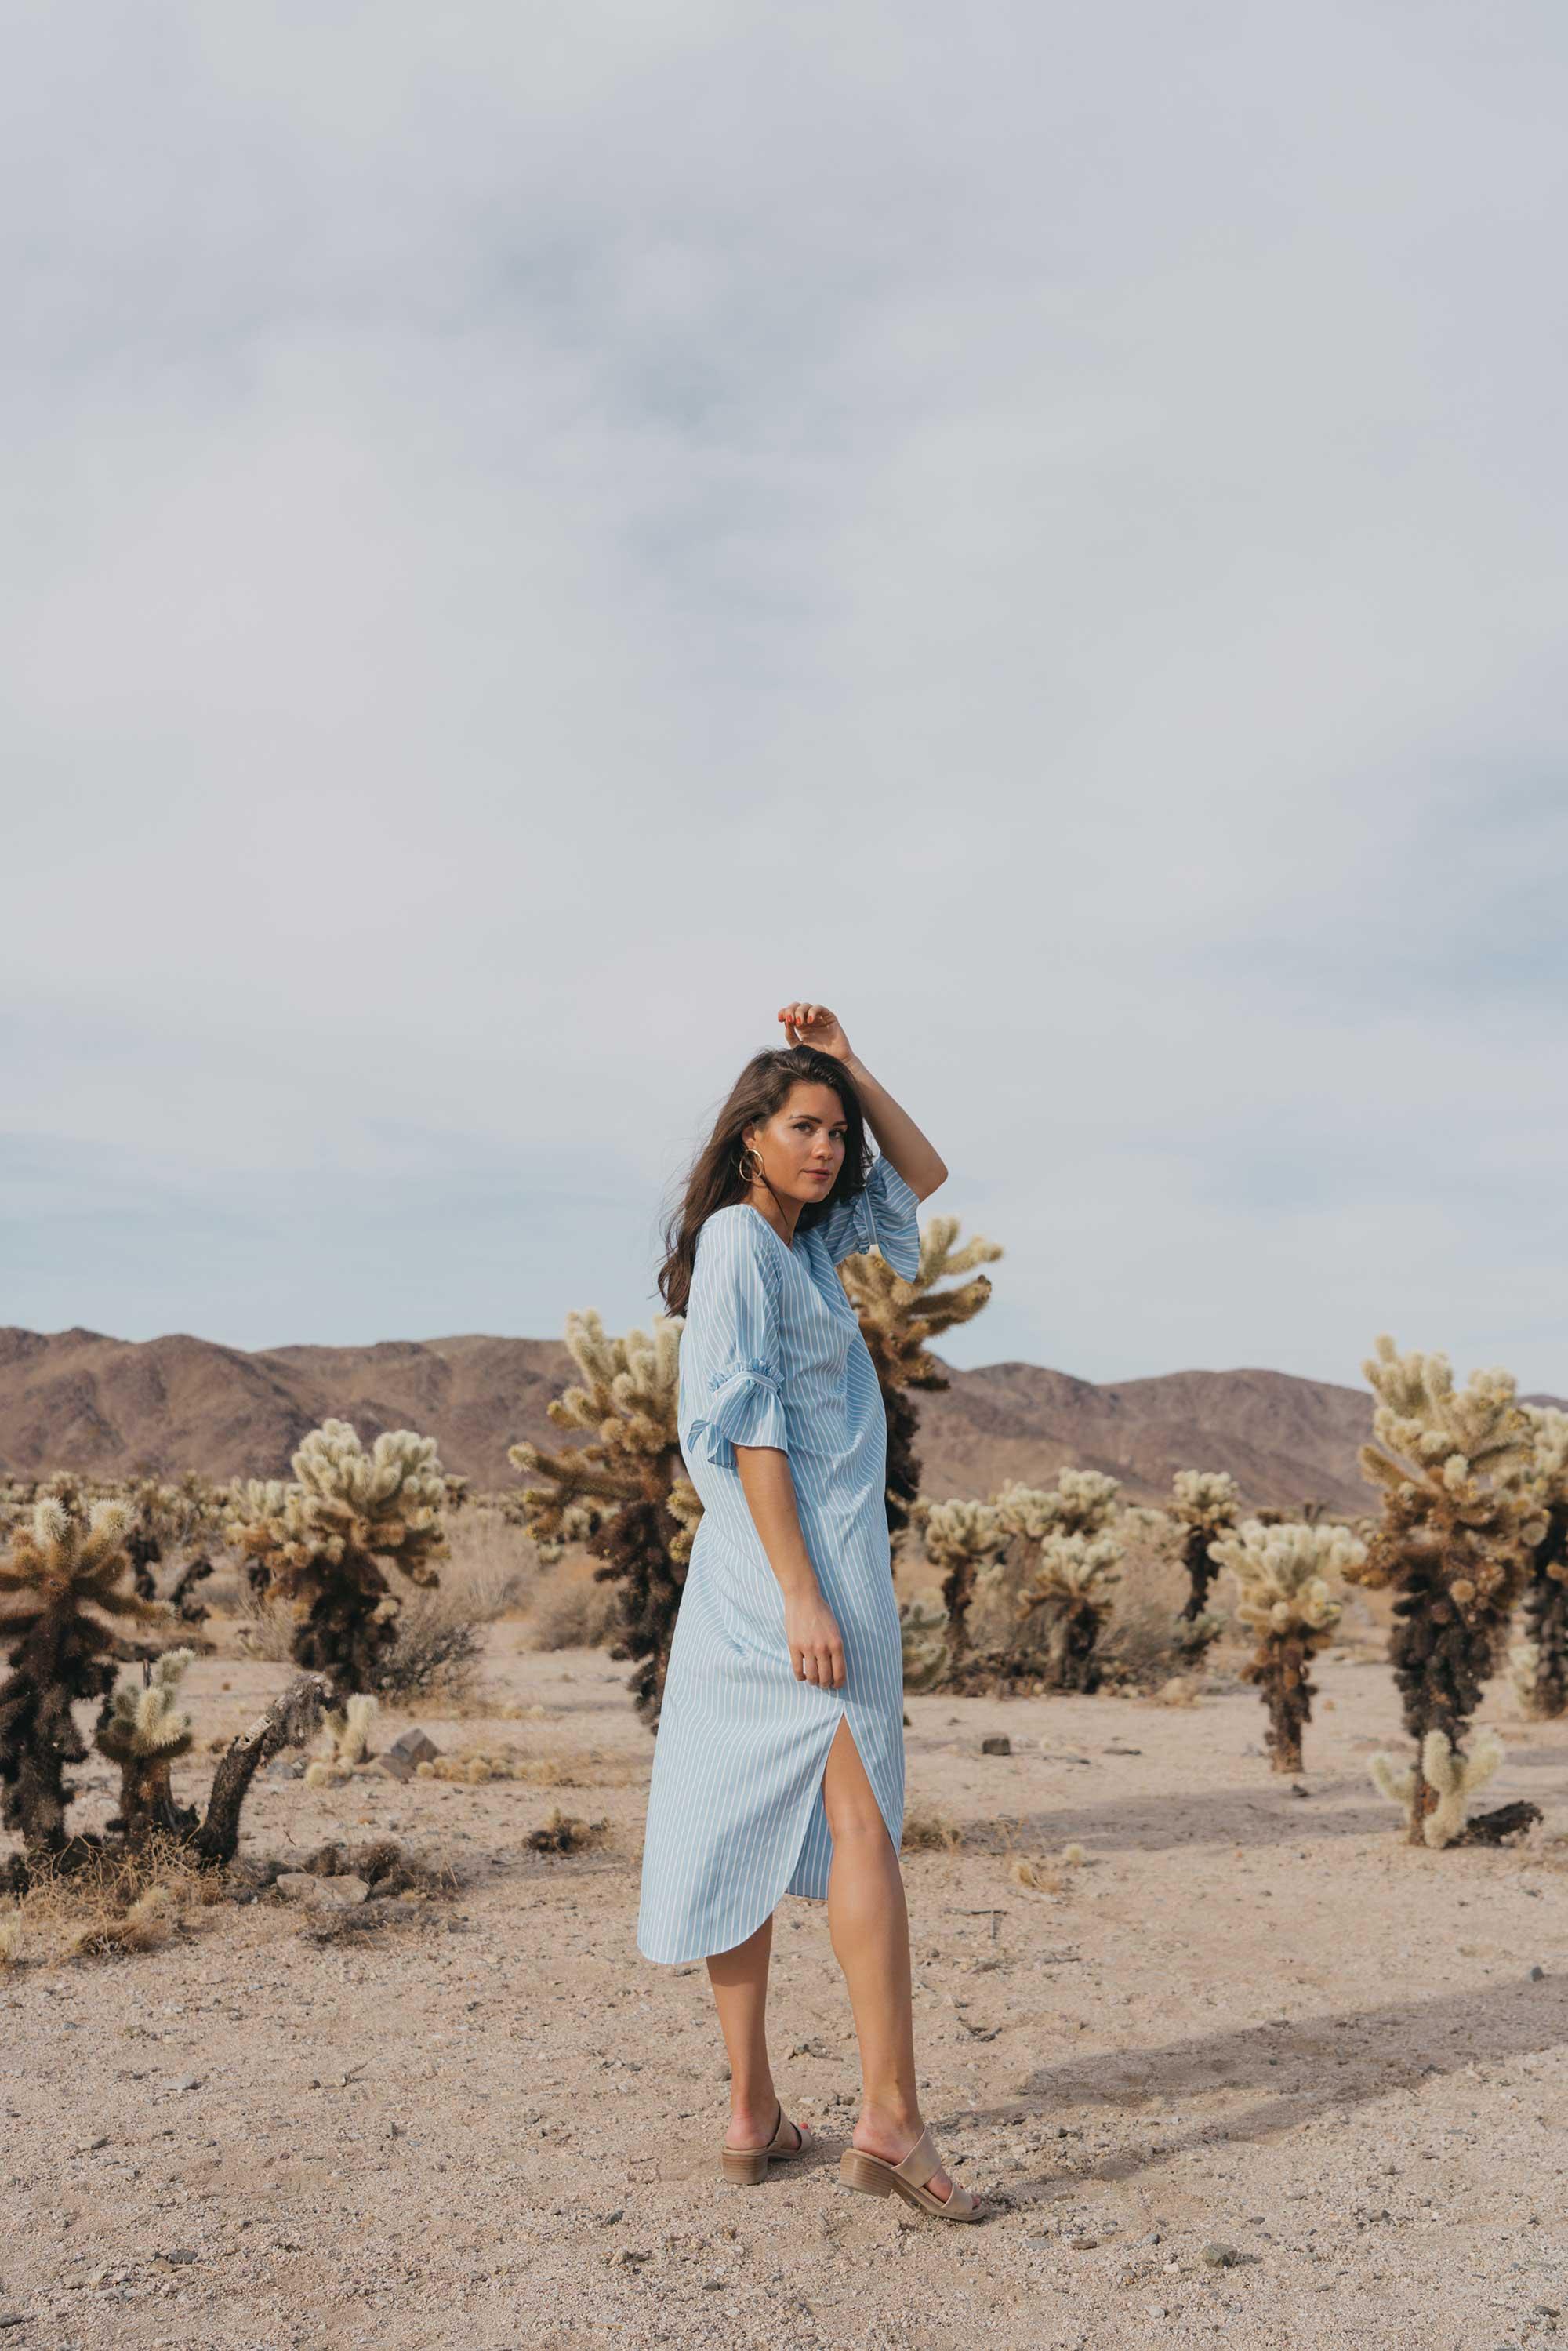 Frill Sleeve Maxi Shirt Dress Festival Outfit Coachella Joshua Tree Cholla Cactus Garden26.jpg